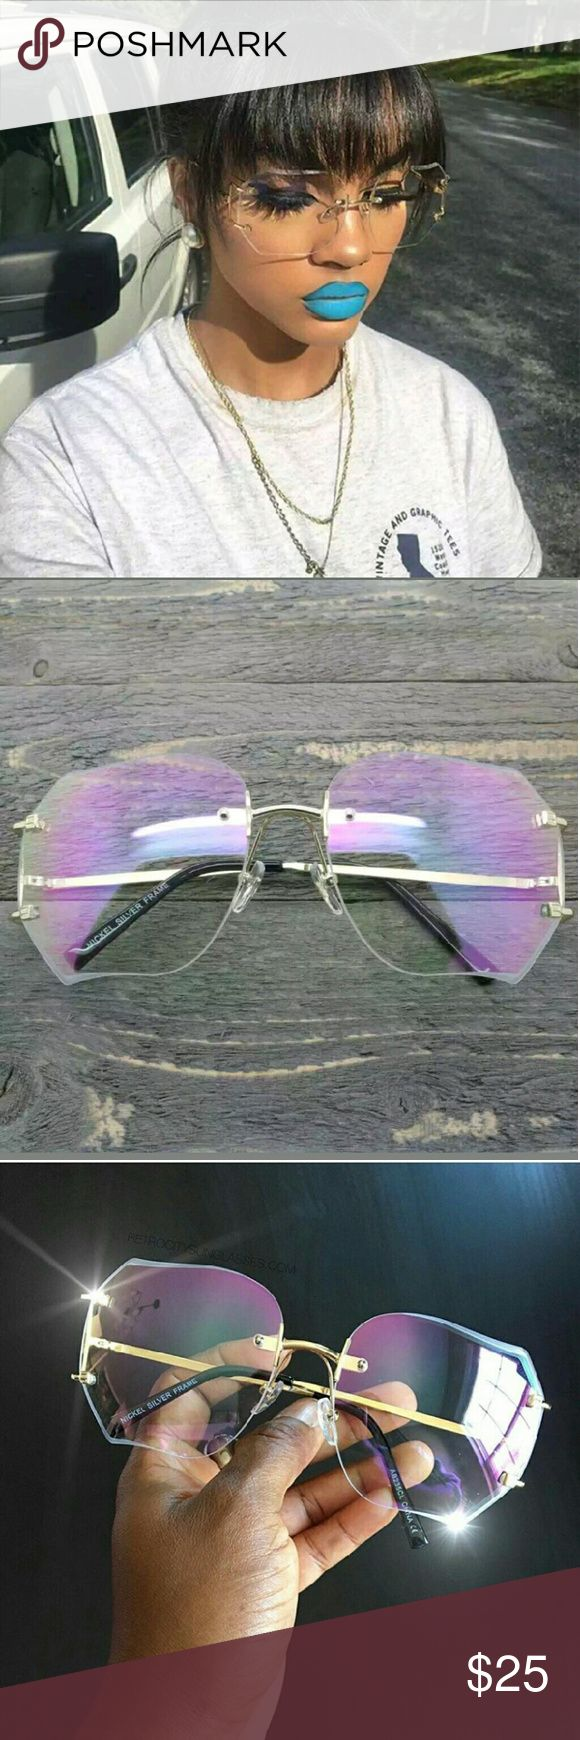 Vintage oversized glasses Vintage clear oversized glasses no brand Accessories Glasses